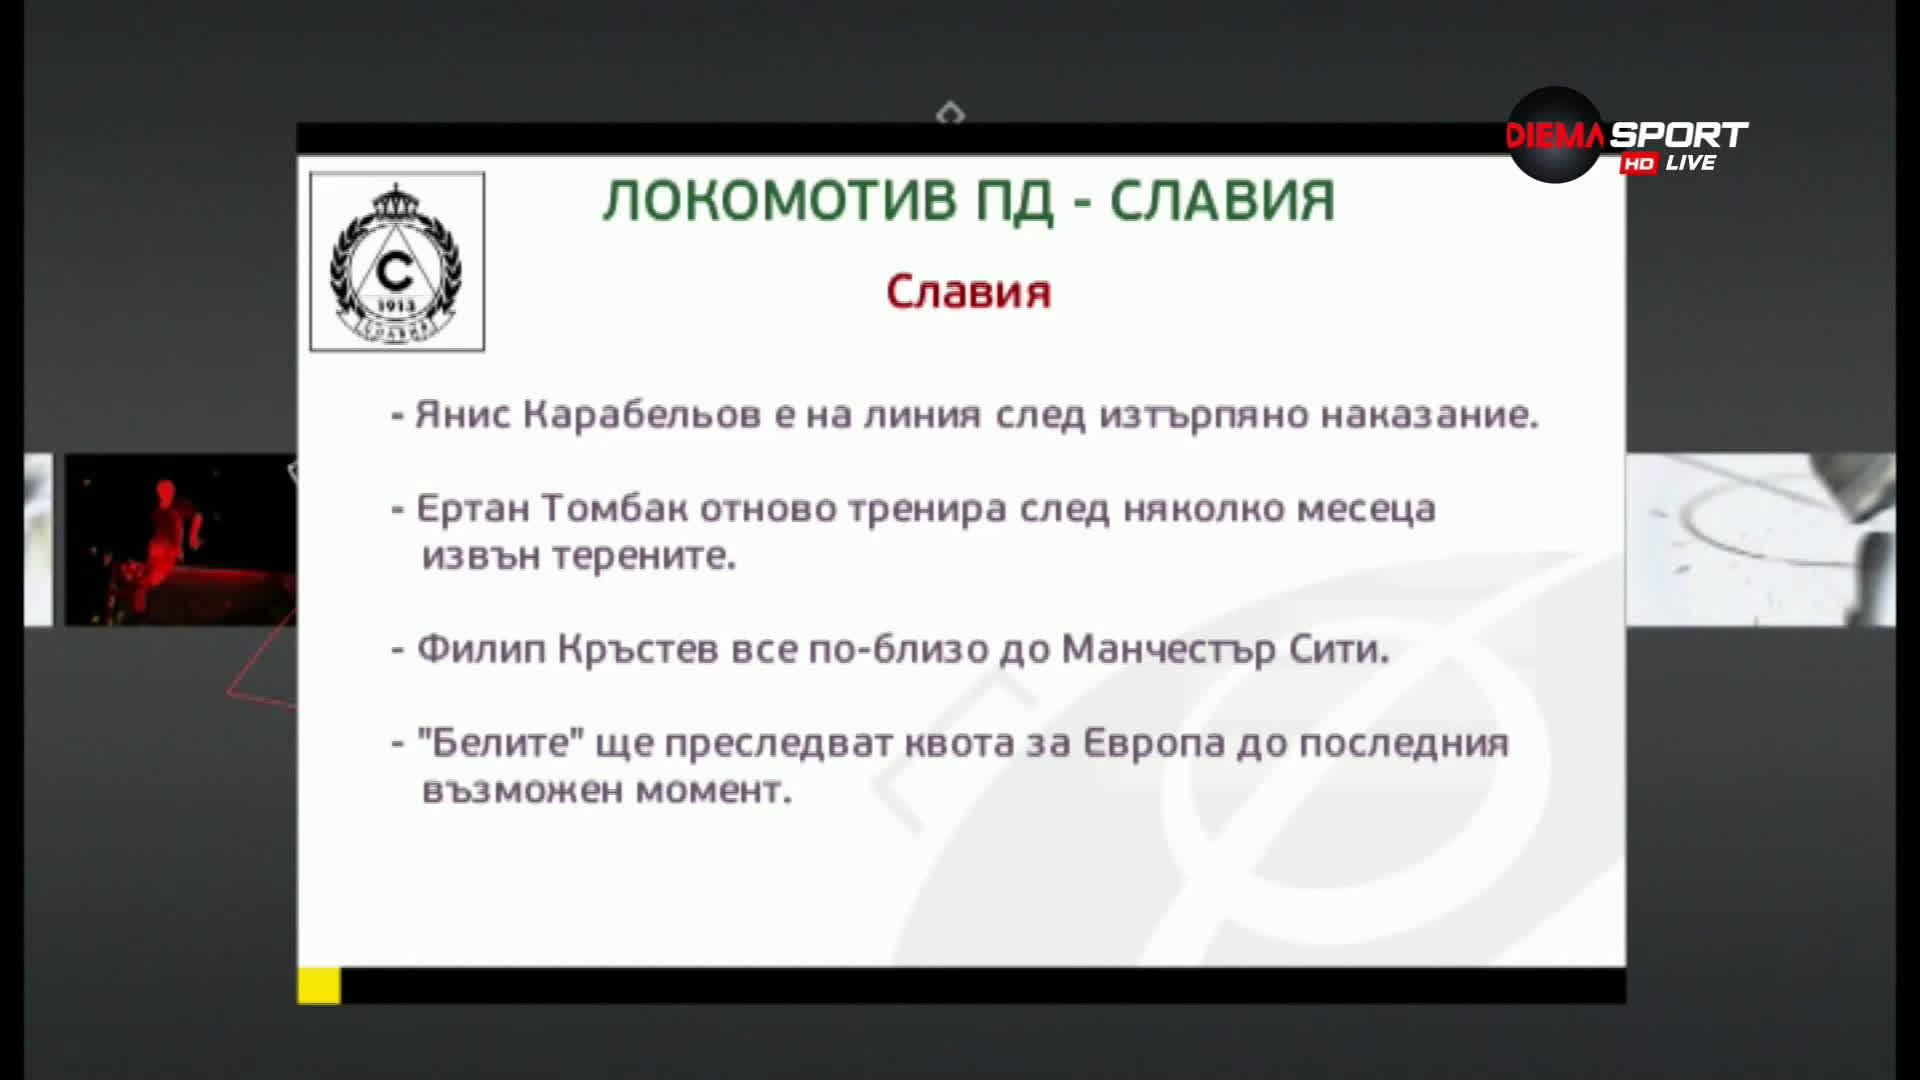 Преди Локомотив Пловдив - Славия